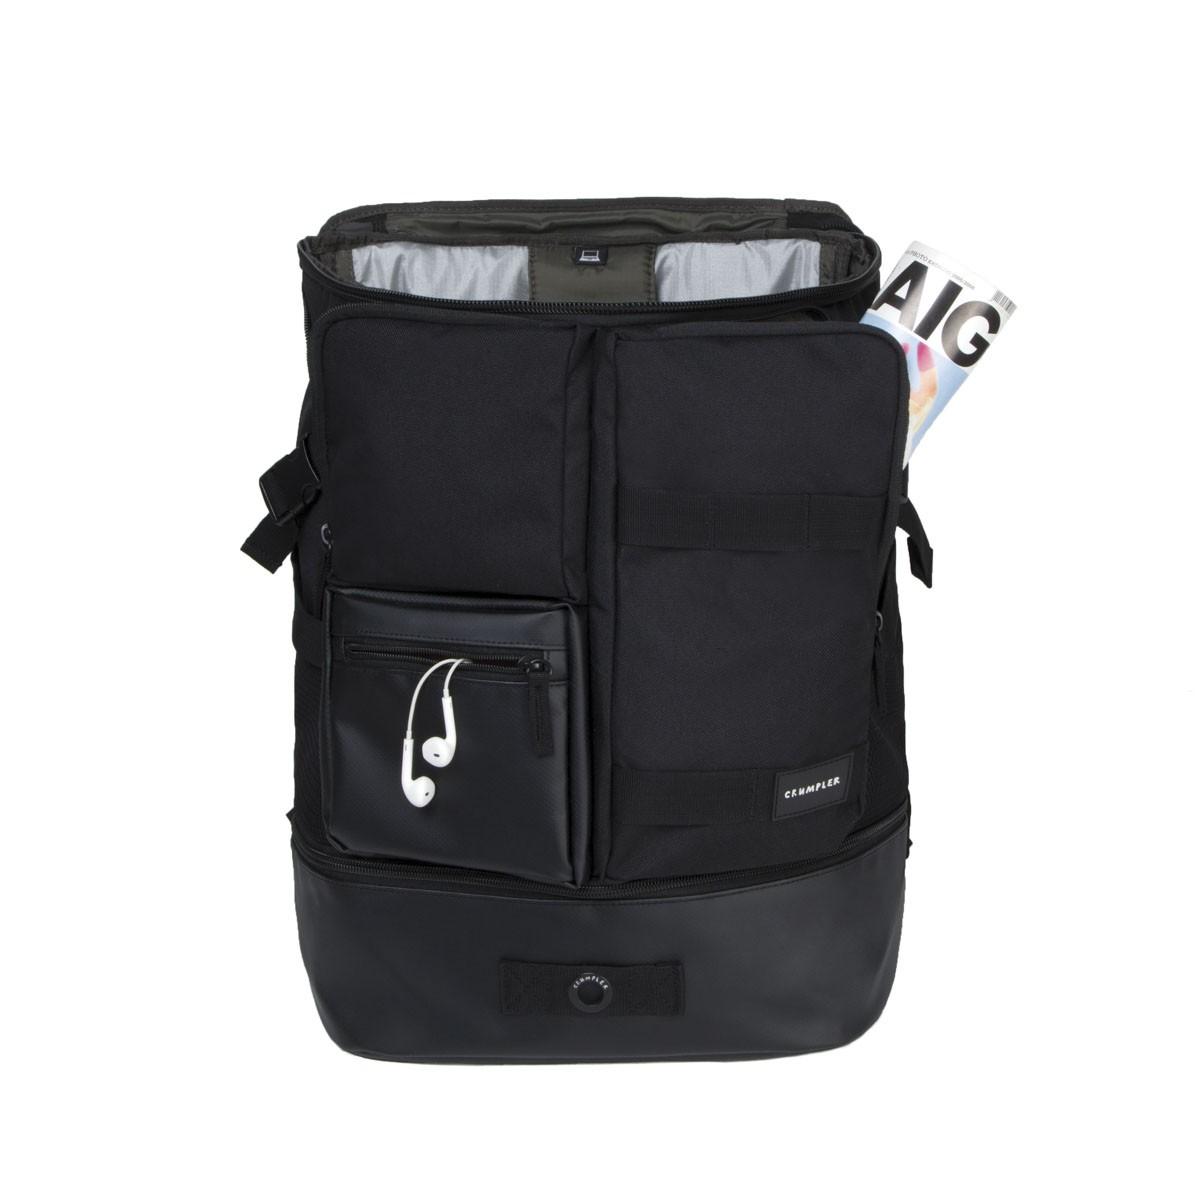 7b330a6e9b0 Kombinovaný batoh do města Crumpler Mighty Geek Backpack black ...